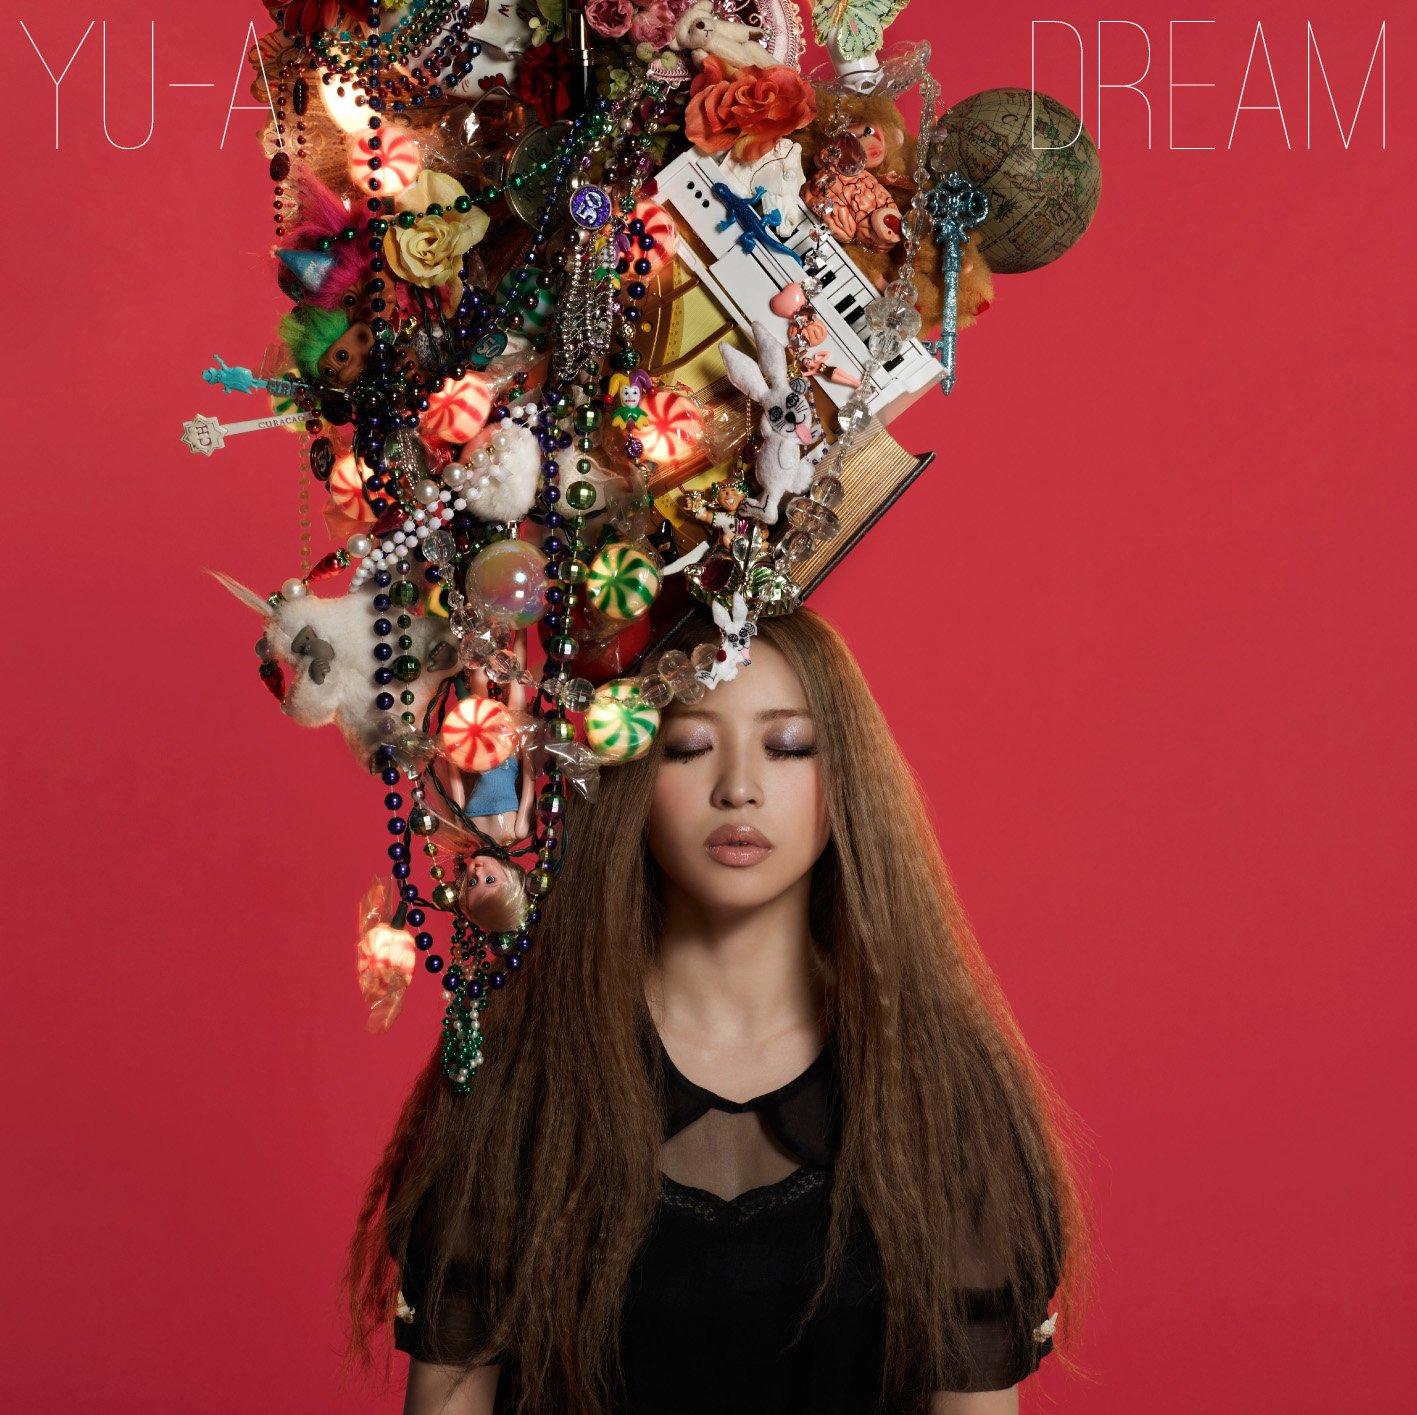 20161117.02.04 YU-A - Dream.jpg